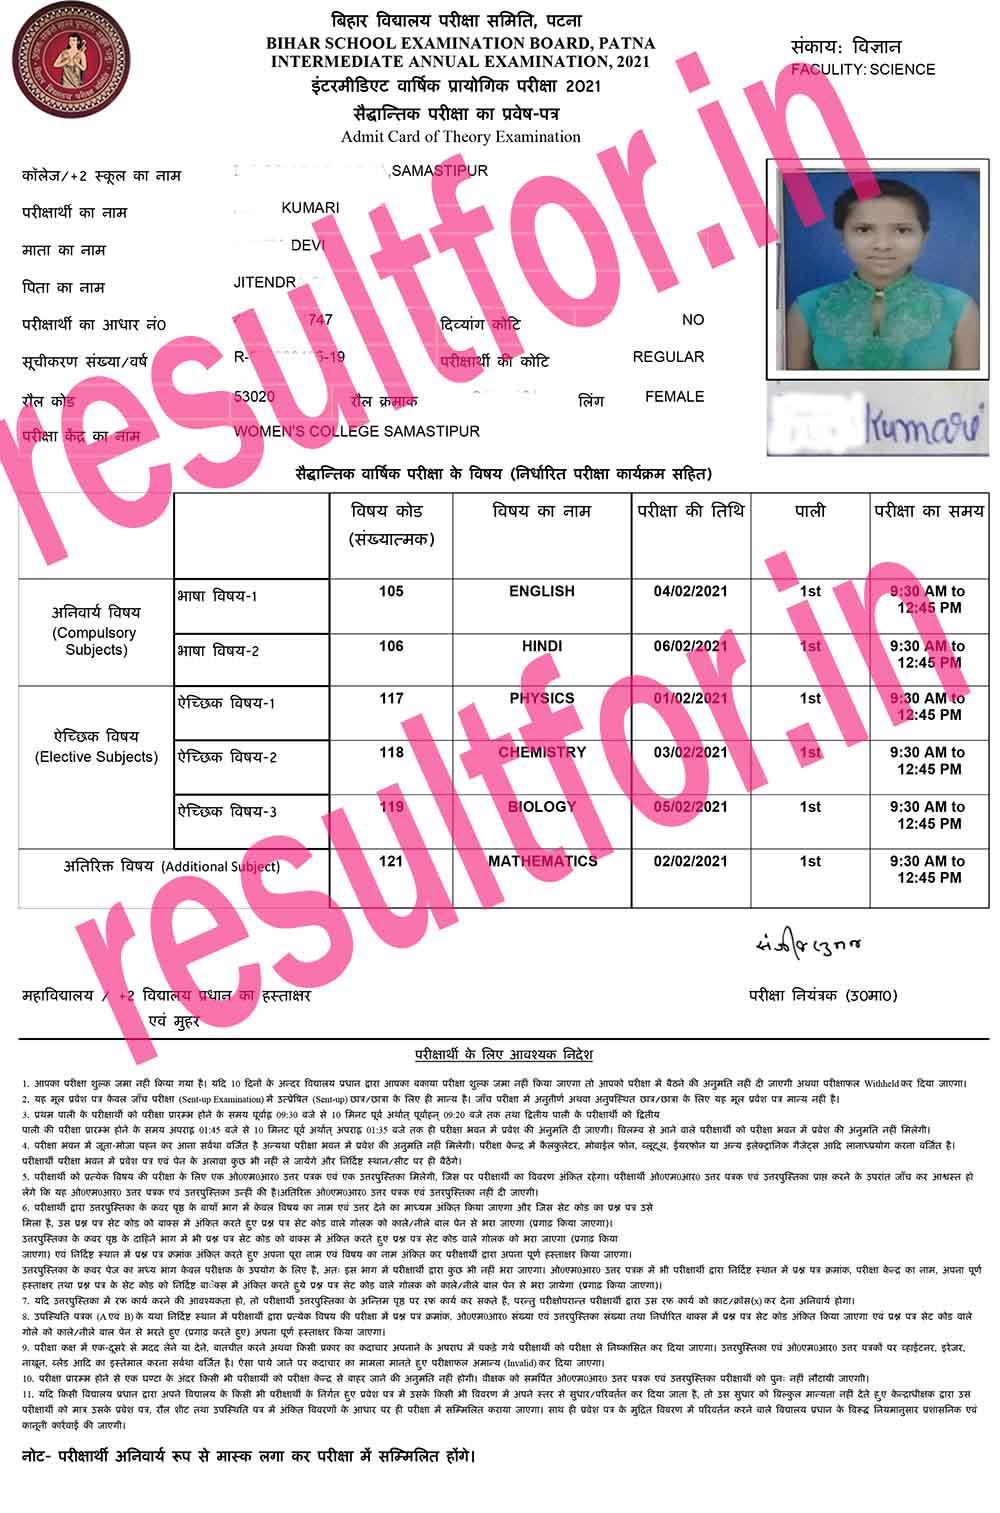 Bihar-board-Inter-Theory-Main-Exam-Admit-Card-2021.